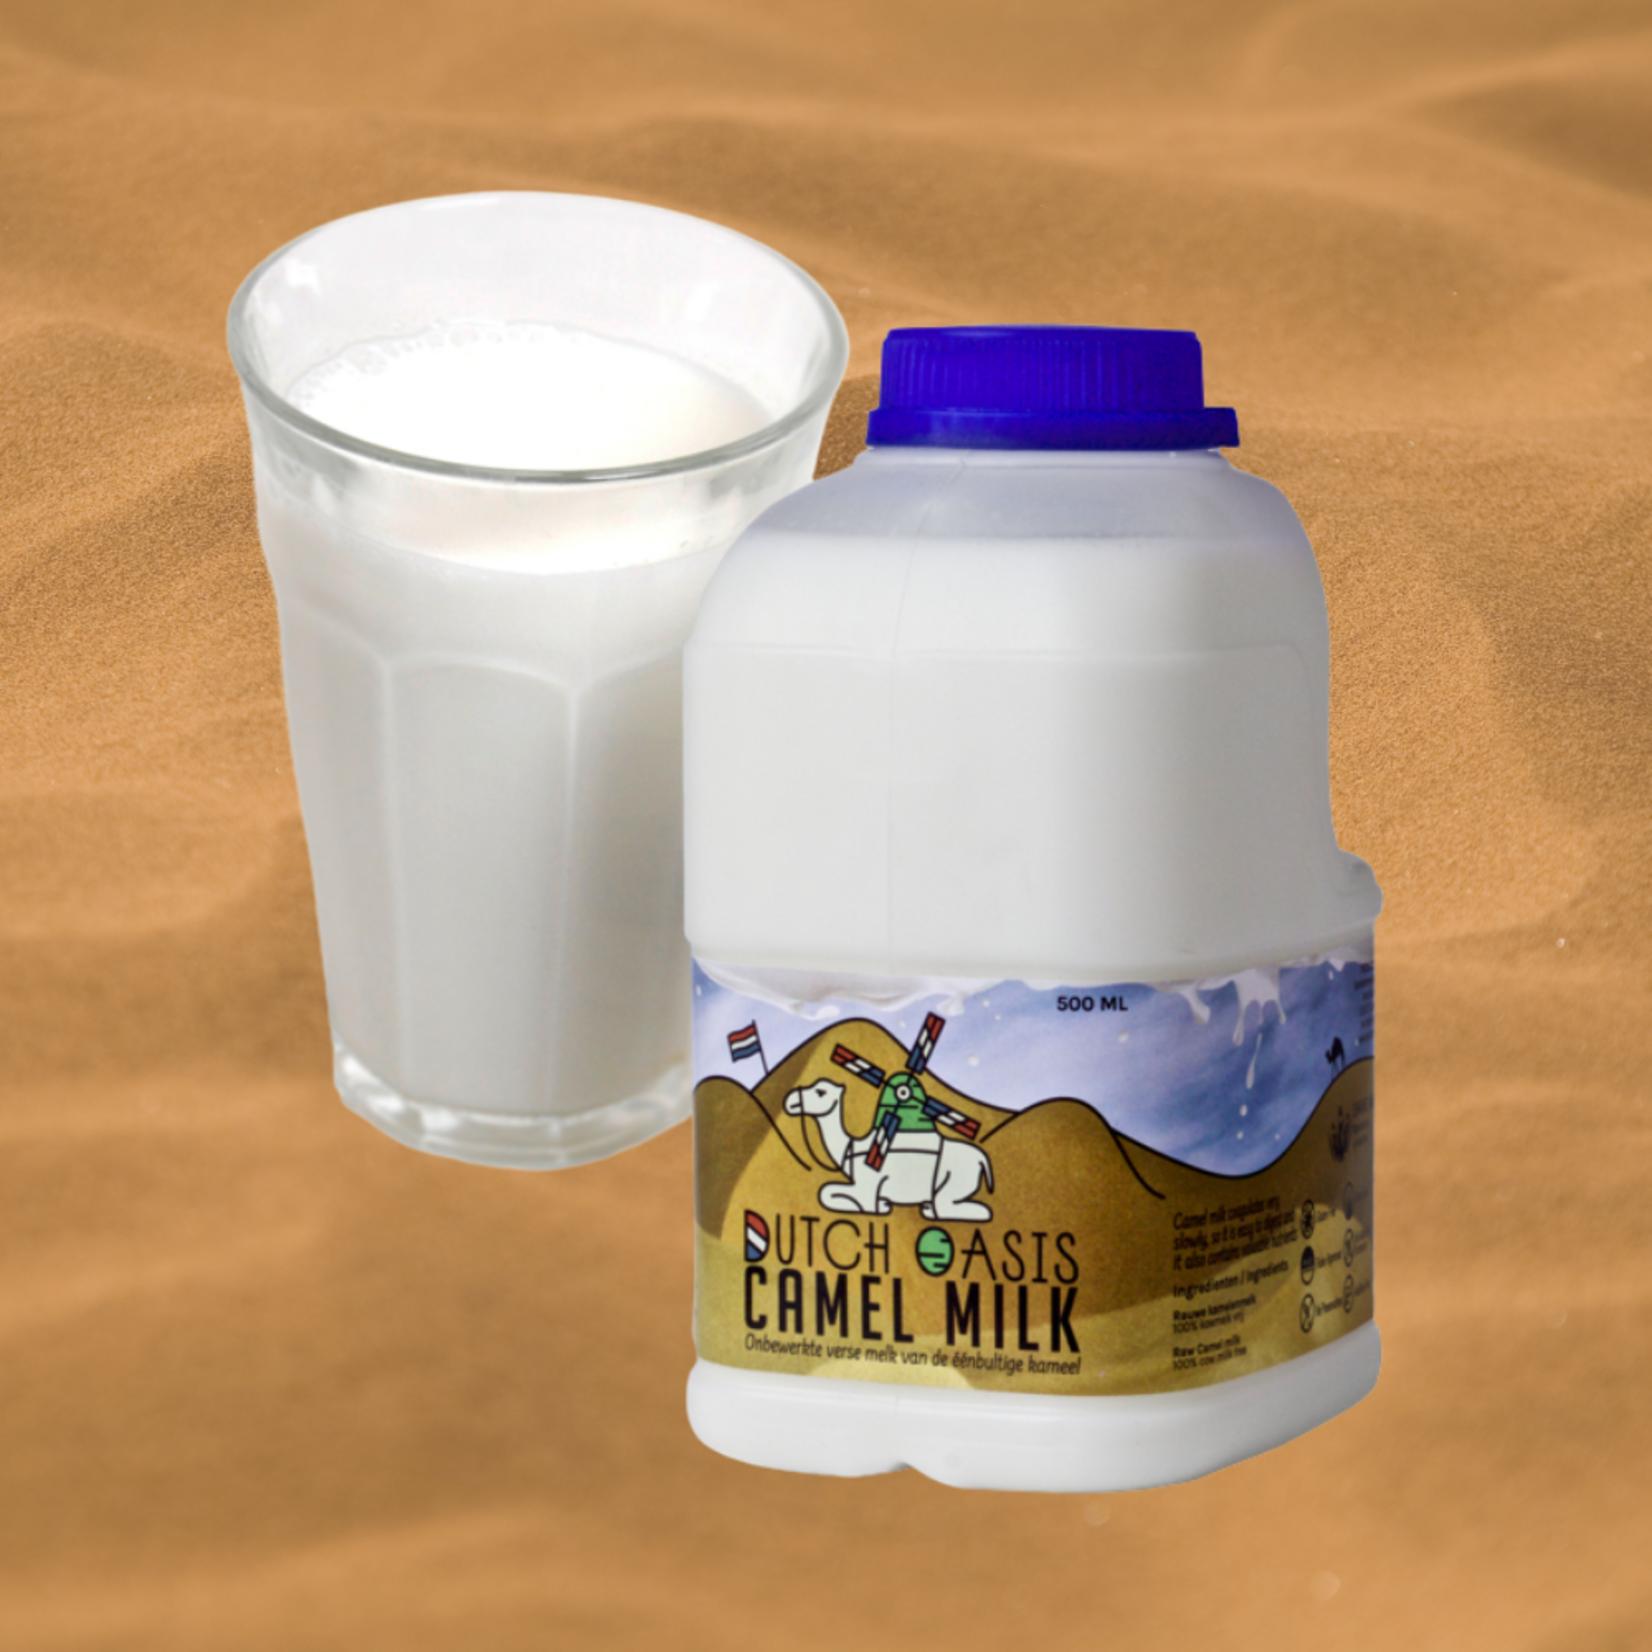 Dutch Oasis 28 bottles (á 500ml) Fresh and raw camel milk